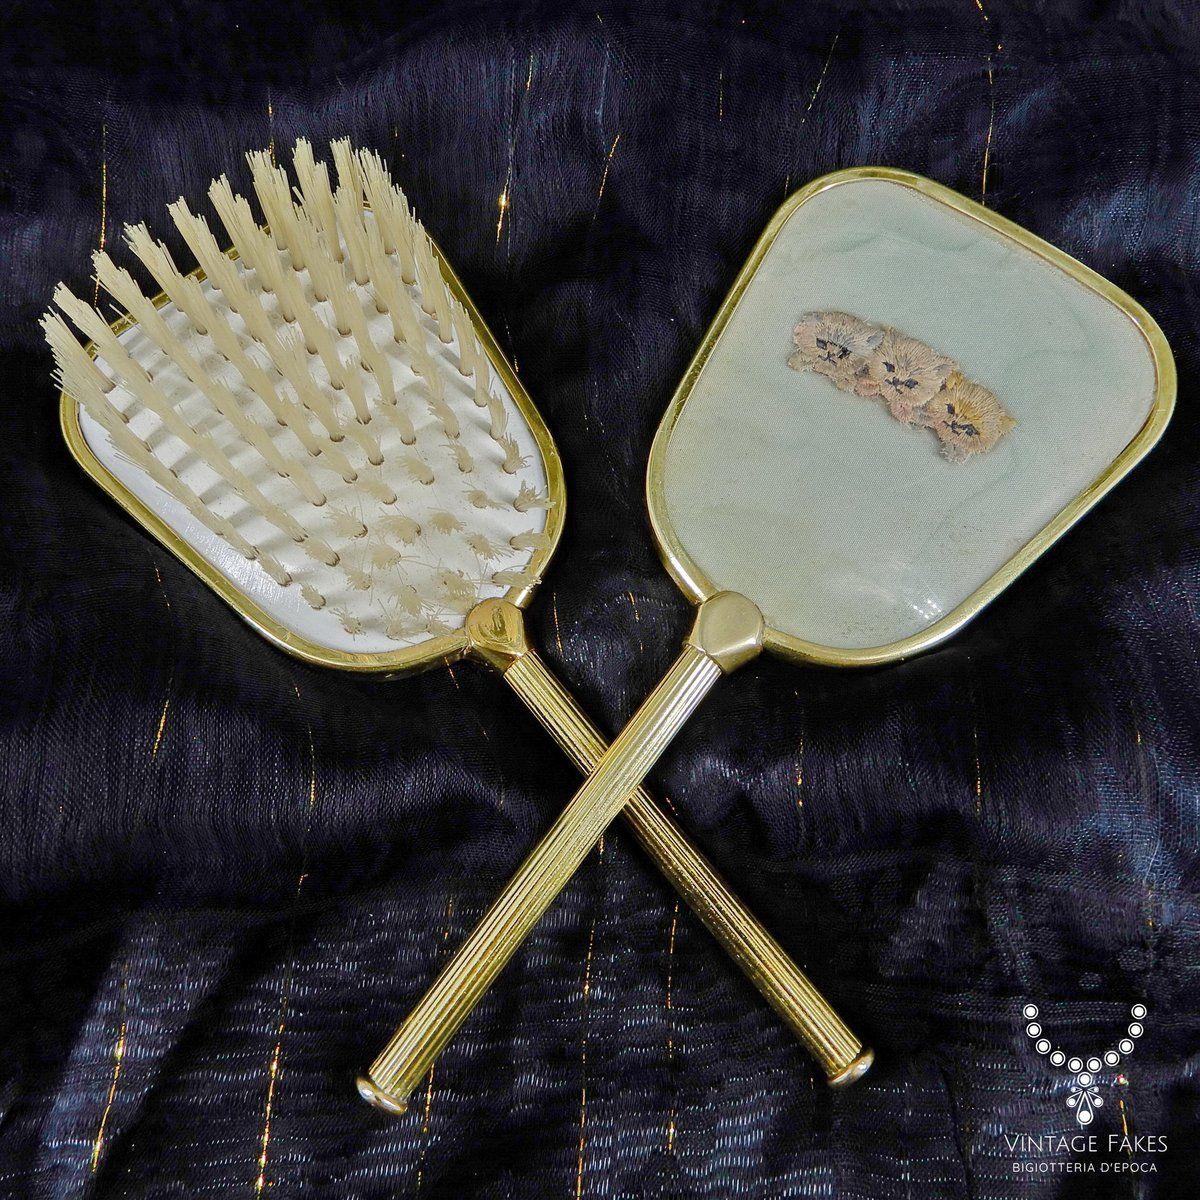 Set Spazzola Specchio.Vanity Set Vintage Anni 50 Spazzola E Specchio In Metallo